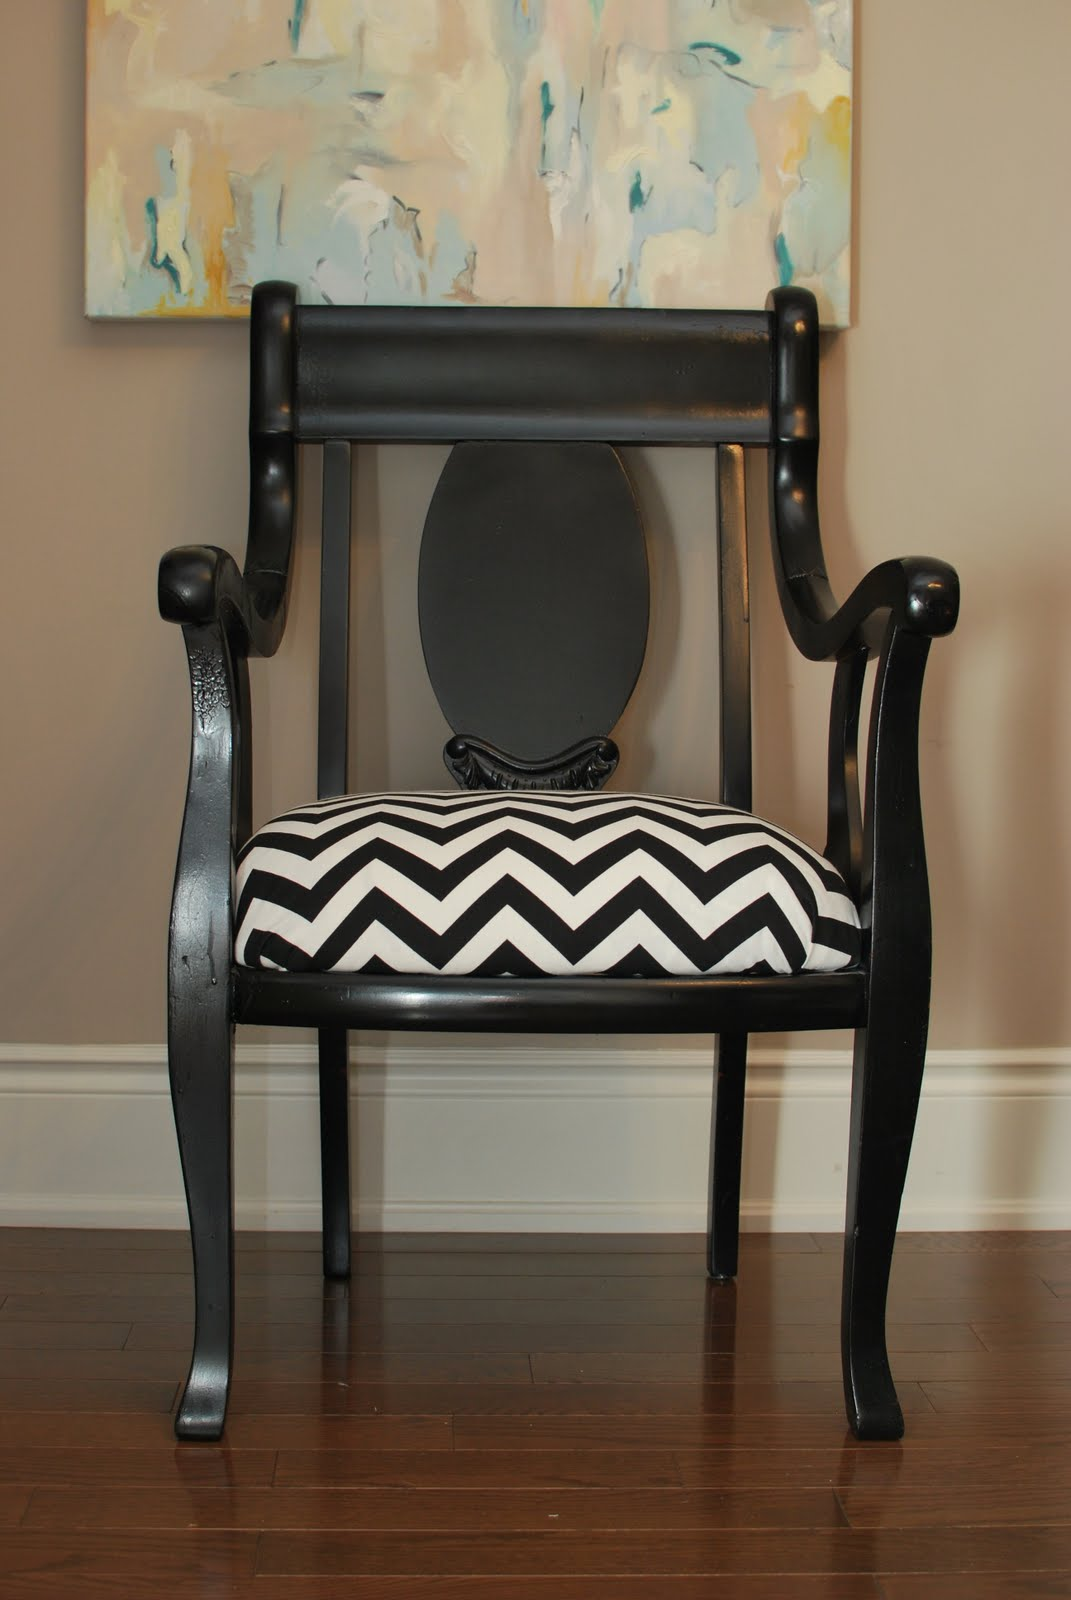 http://i0.wp.com/4.bp.blogspot.com/_Cq9ZHL9A6G0/THL0-mdhiRI/AAAAAAAAE04/uUITKsZ7peo/s1600/diy+chair+030.JPG?resize=356%2C533